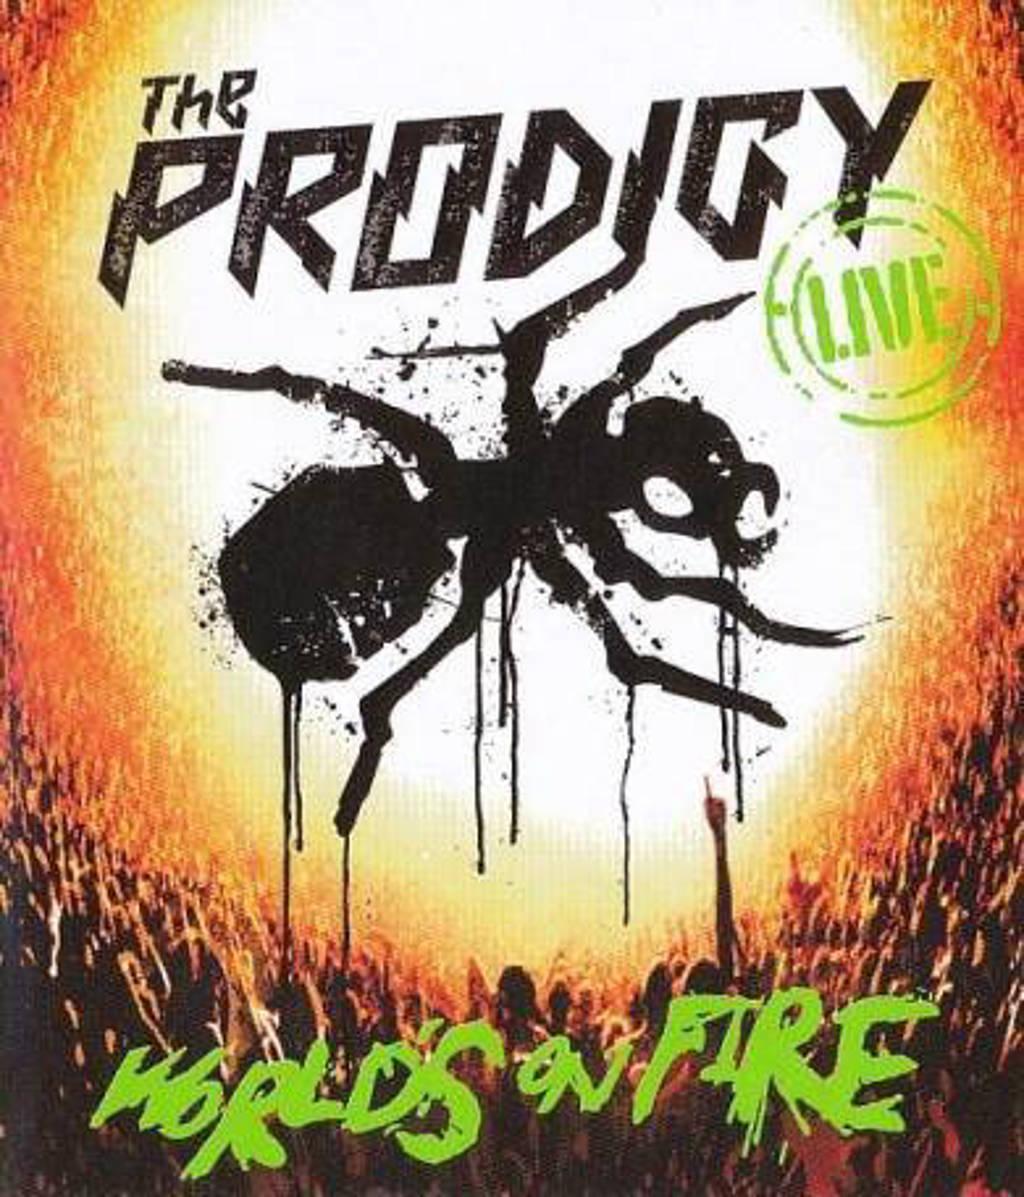 Prodigy - Live - World's on fire (Blu-ray)